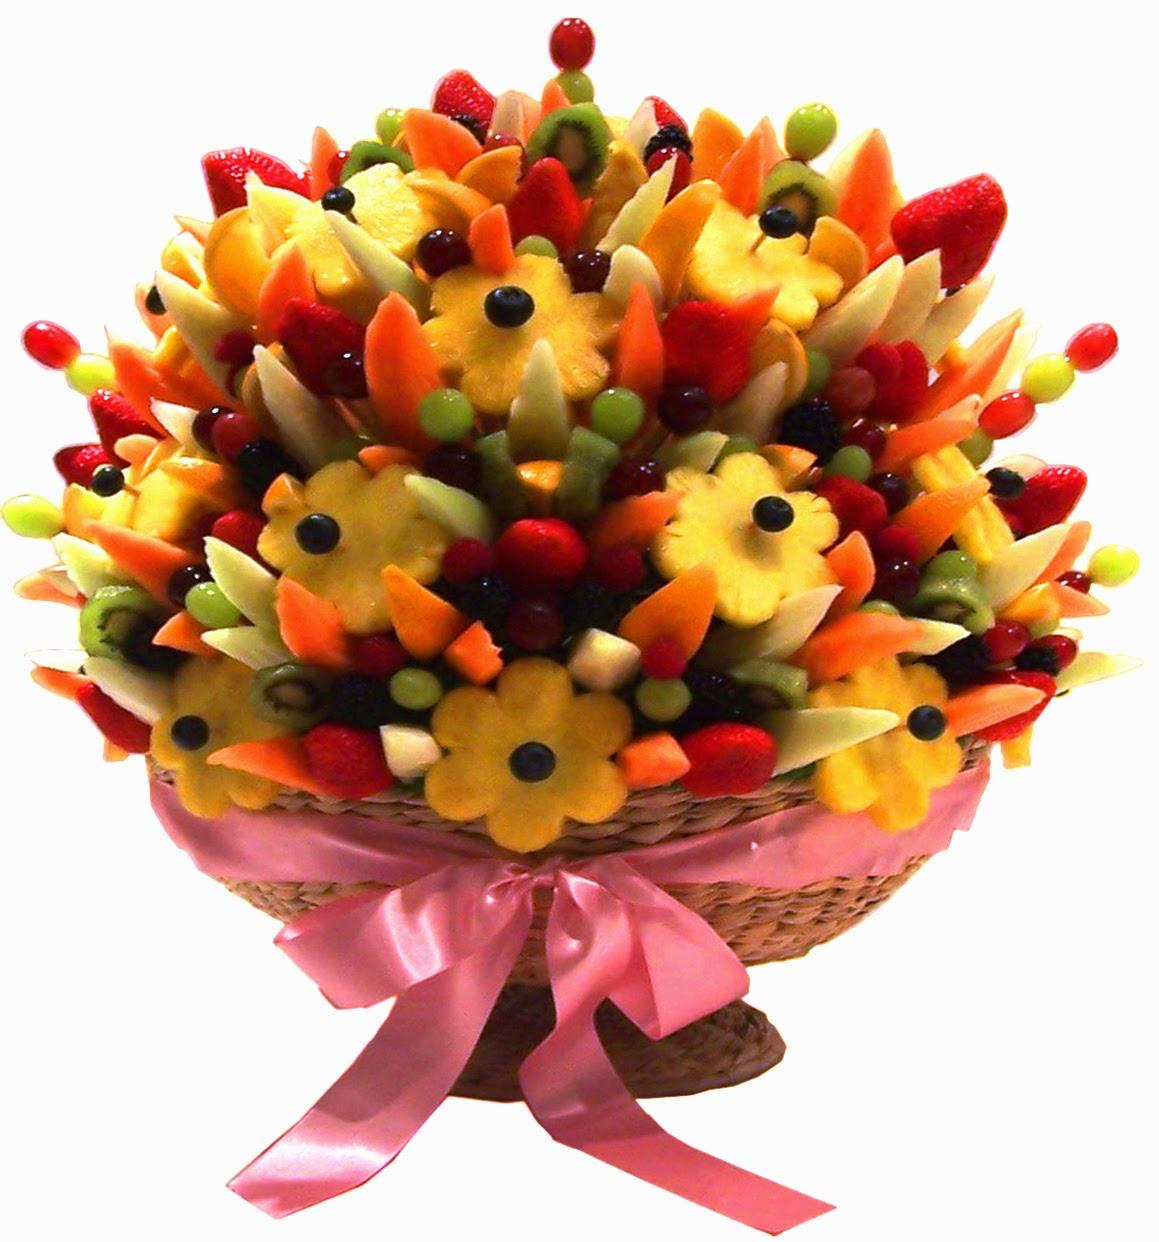 Baby Gift Edible Arrangements : Fruit baskets john hunter hospital